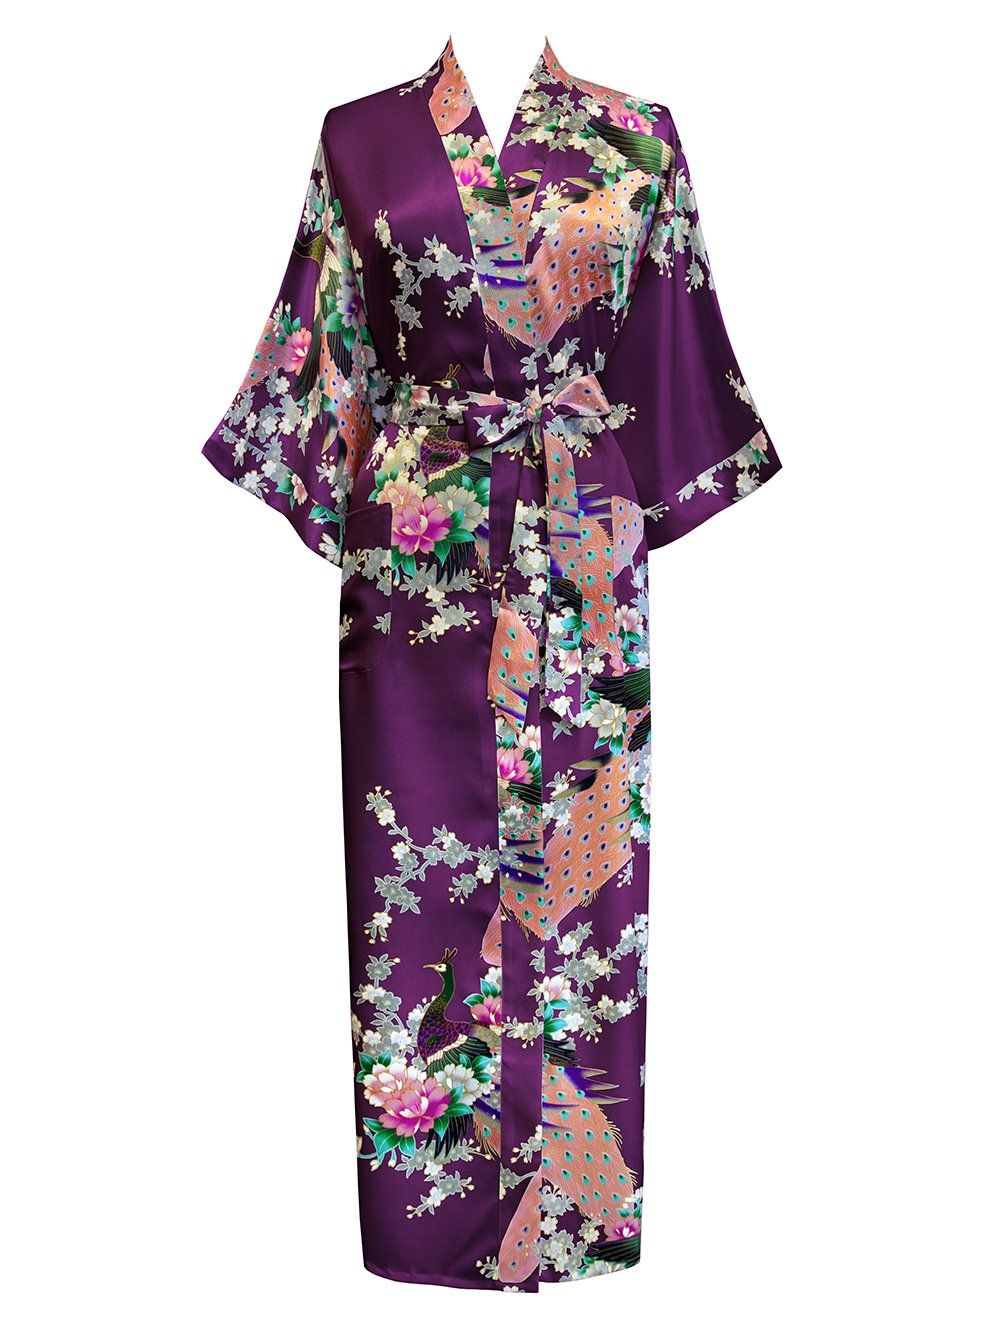 edf8d3dcbe3ae Old Shanghai Women s Kimono Long Robe - Peacock   Blossoms - Plum at Amazon  Women s Clothing store